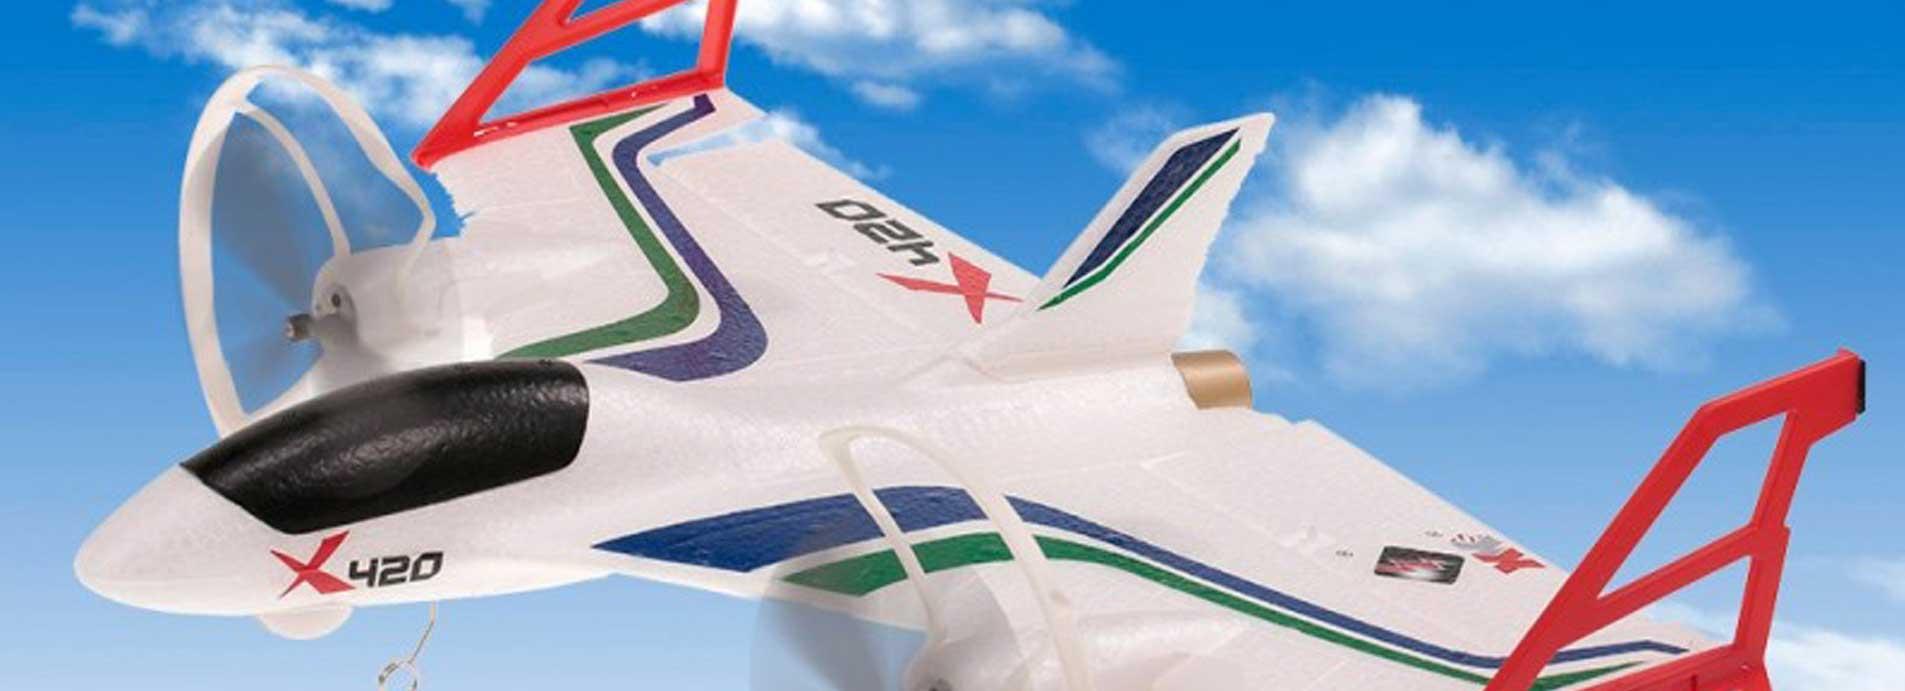 Elige tu primer avión teledirigido paso a paso